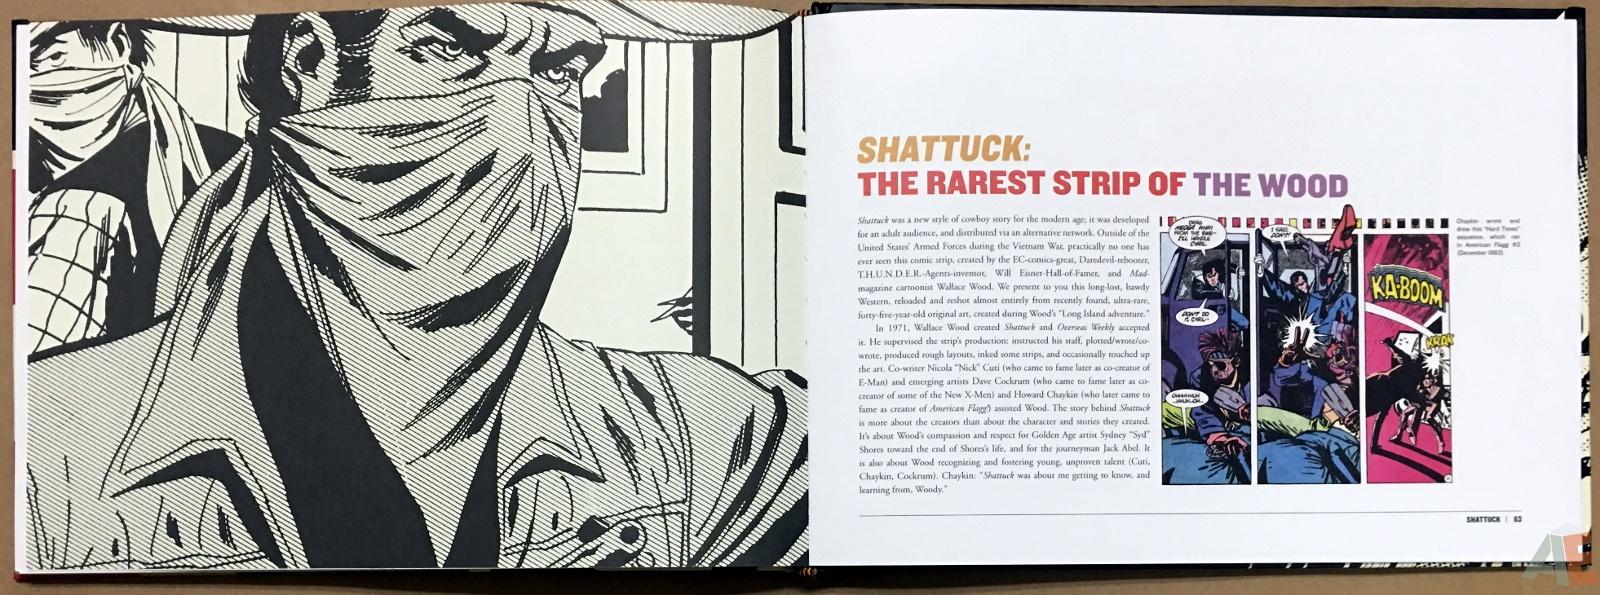 Wallace Wood Presents Shattuck Original Art Edition 24